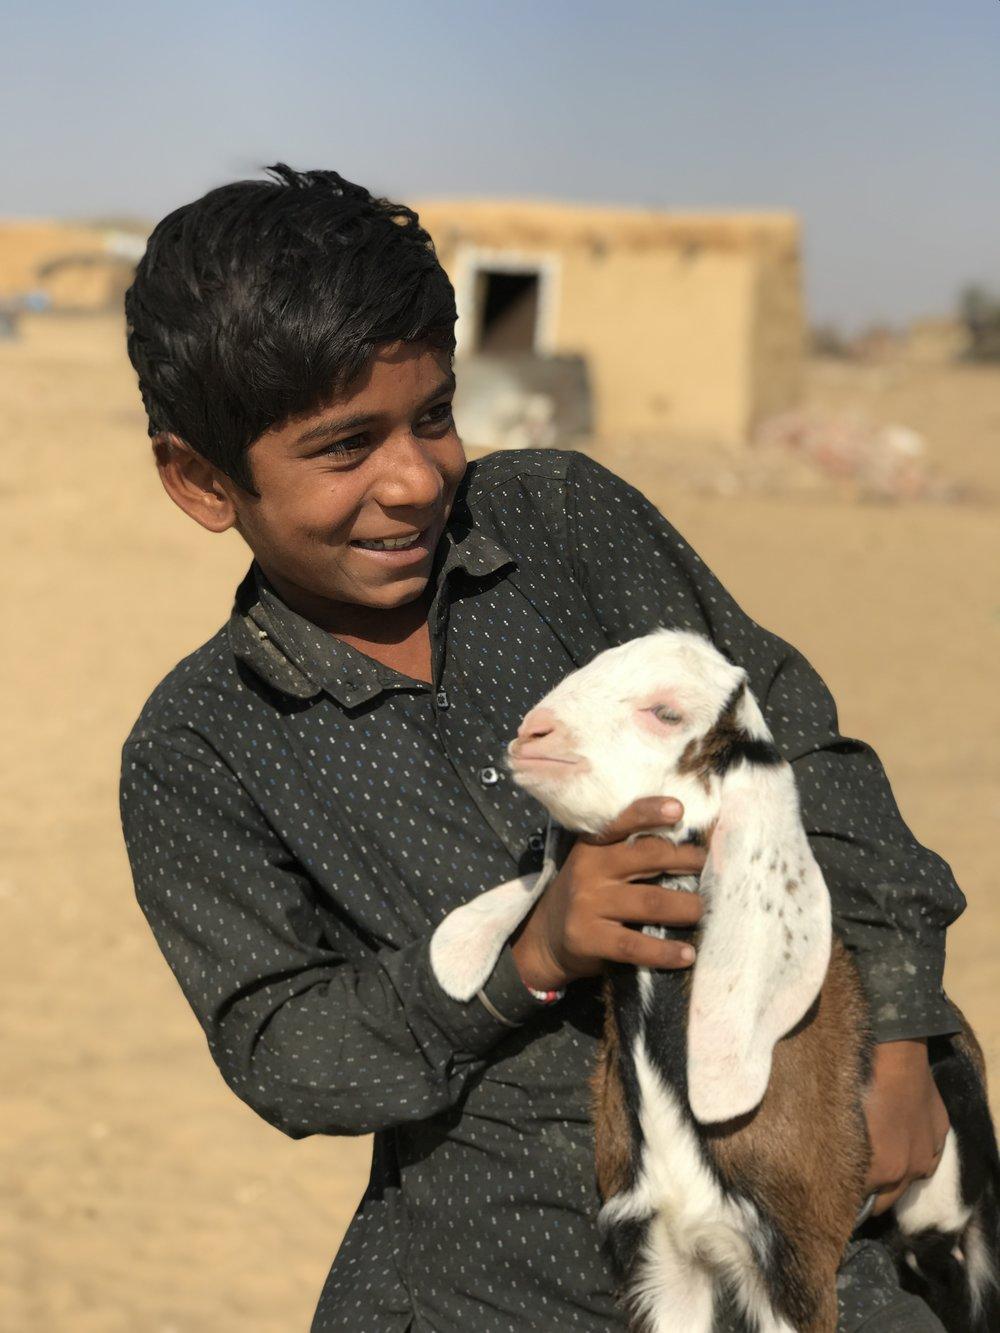 Gumnewala India - Story At Every Corner